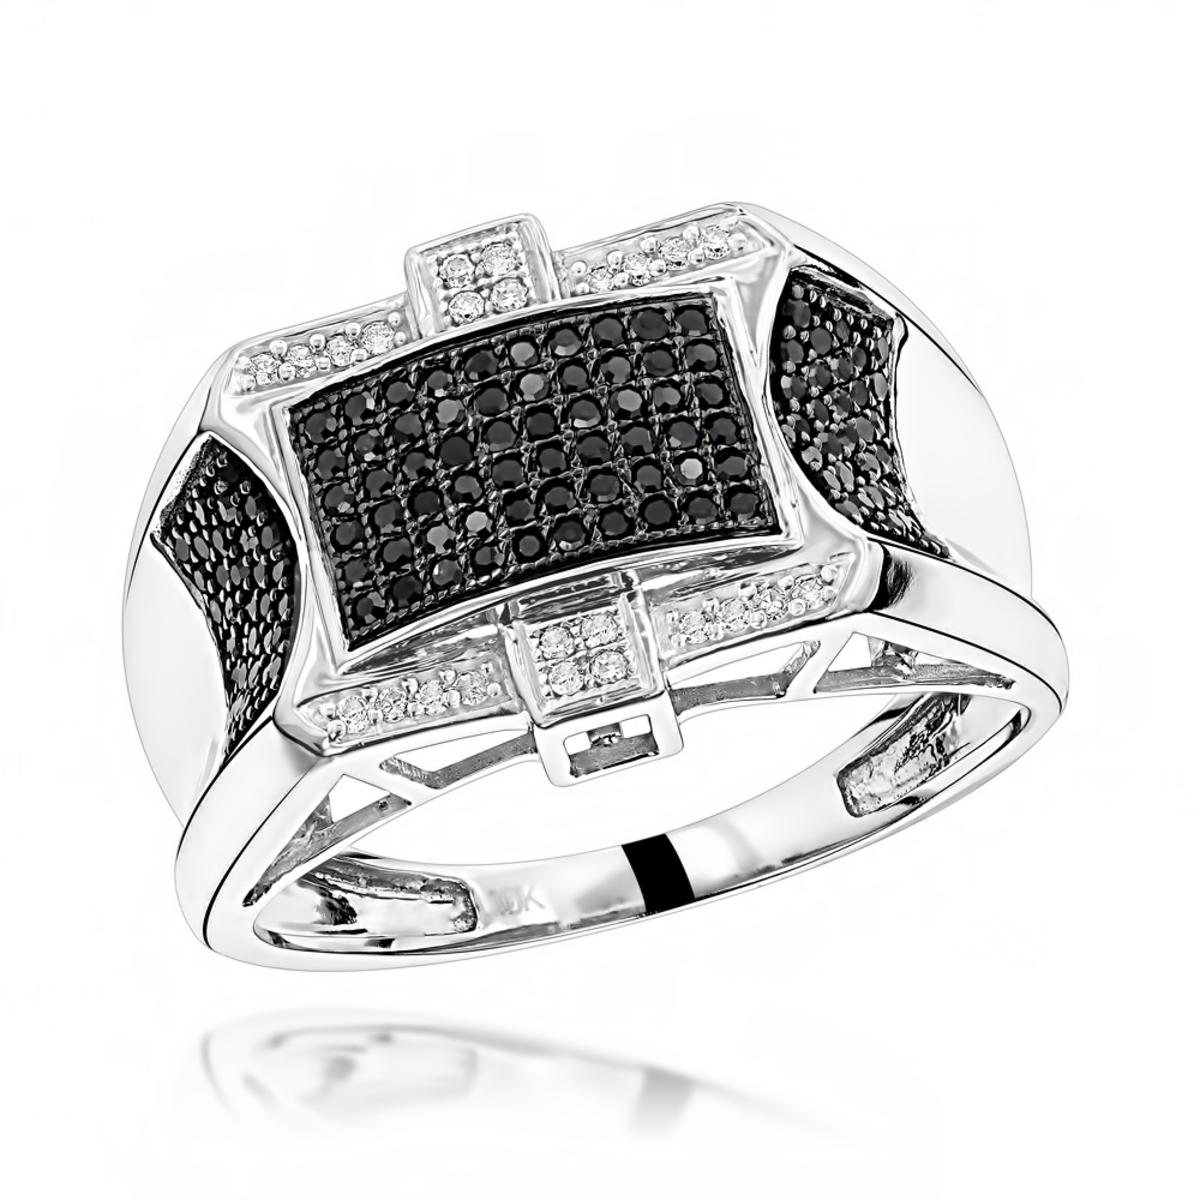 10K Black and White Mens Diamond Ring 0.5ct